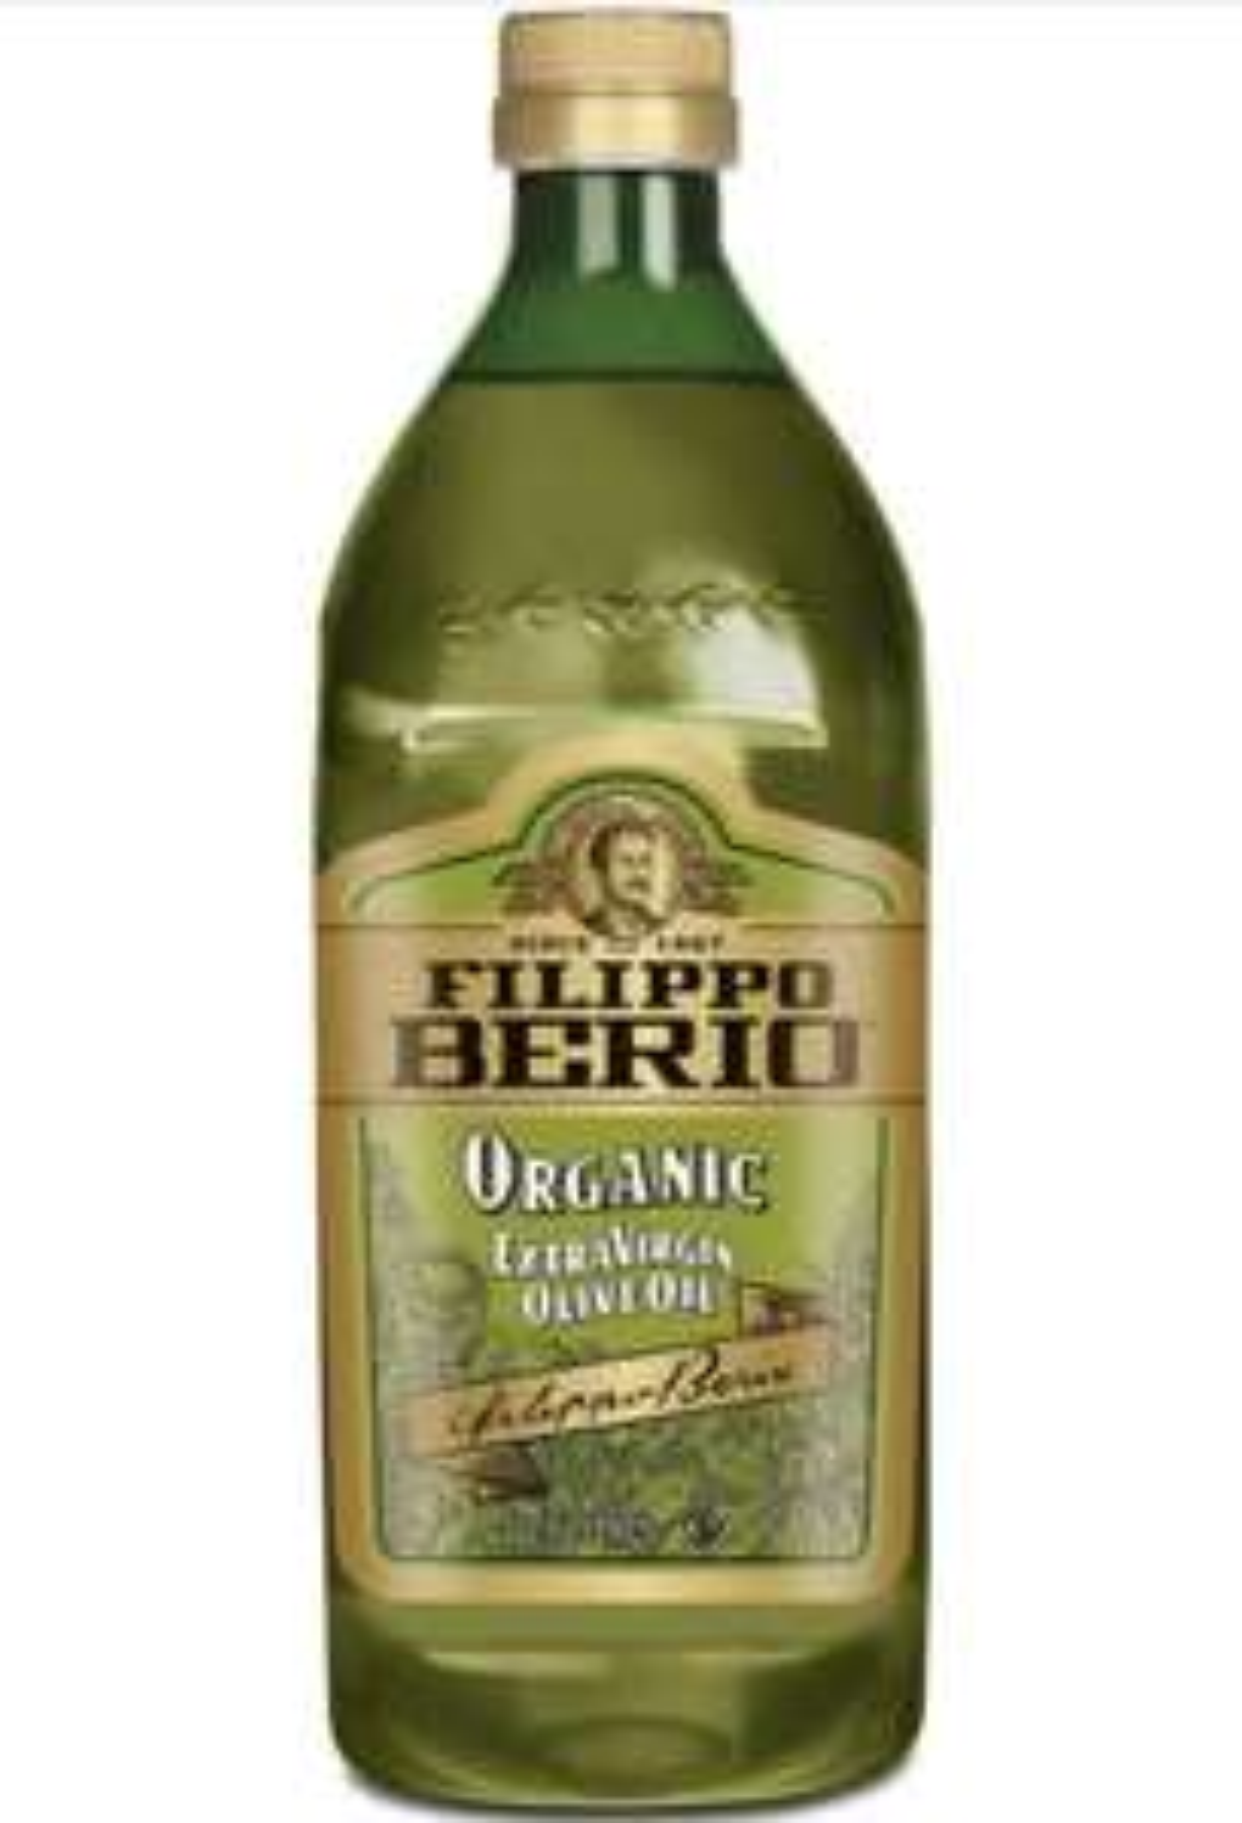 1.5 Litre Filippo Berio Organic Extra Virgin Olive Oil reduced to £1.20 at Asda Govan